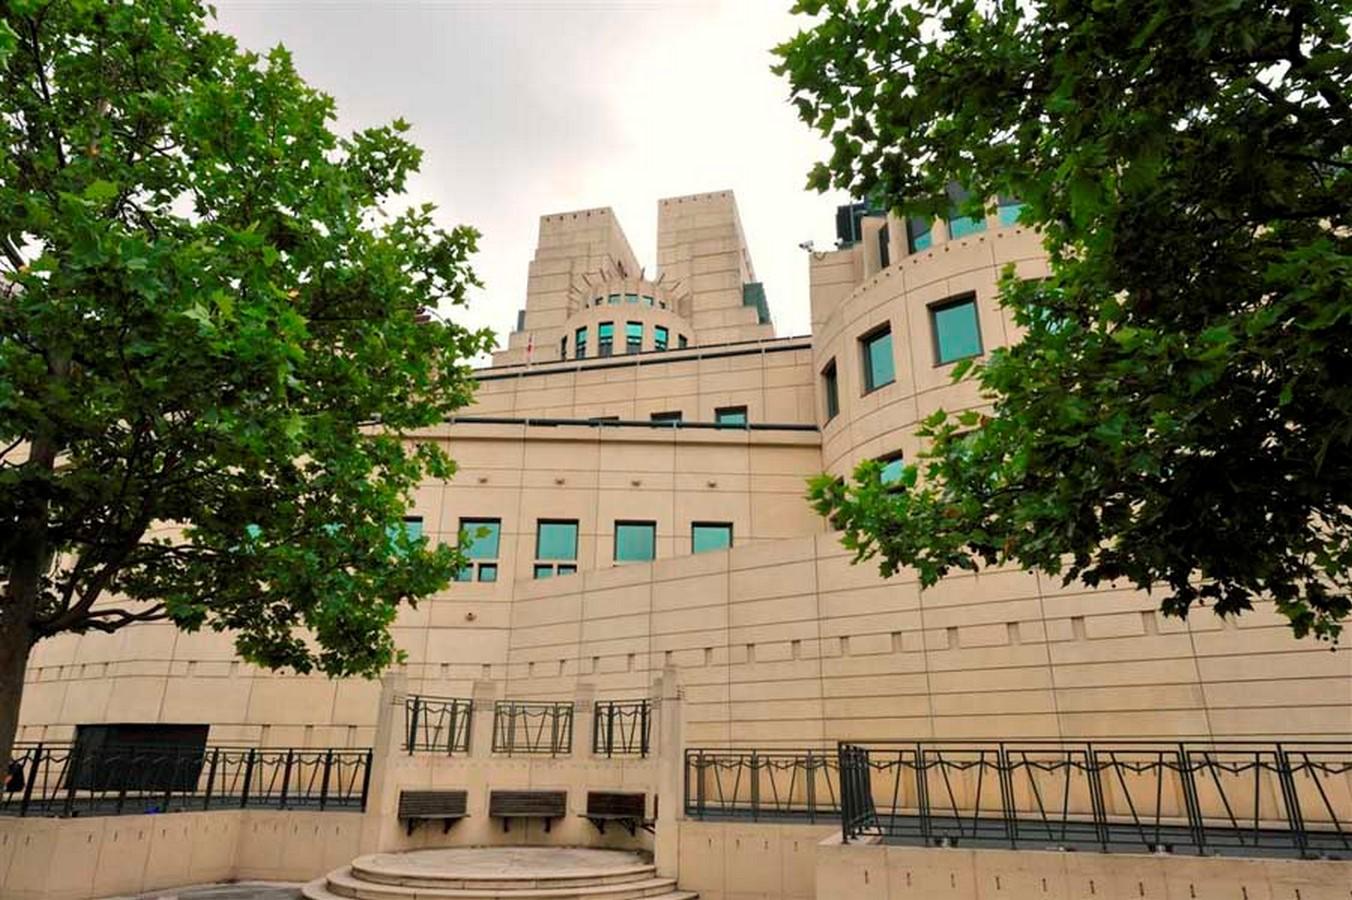 MI6 building, London, UK - SHeet3